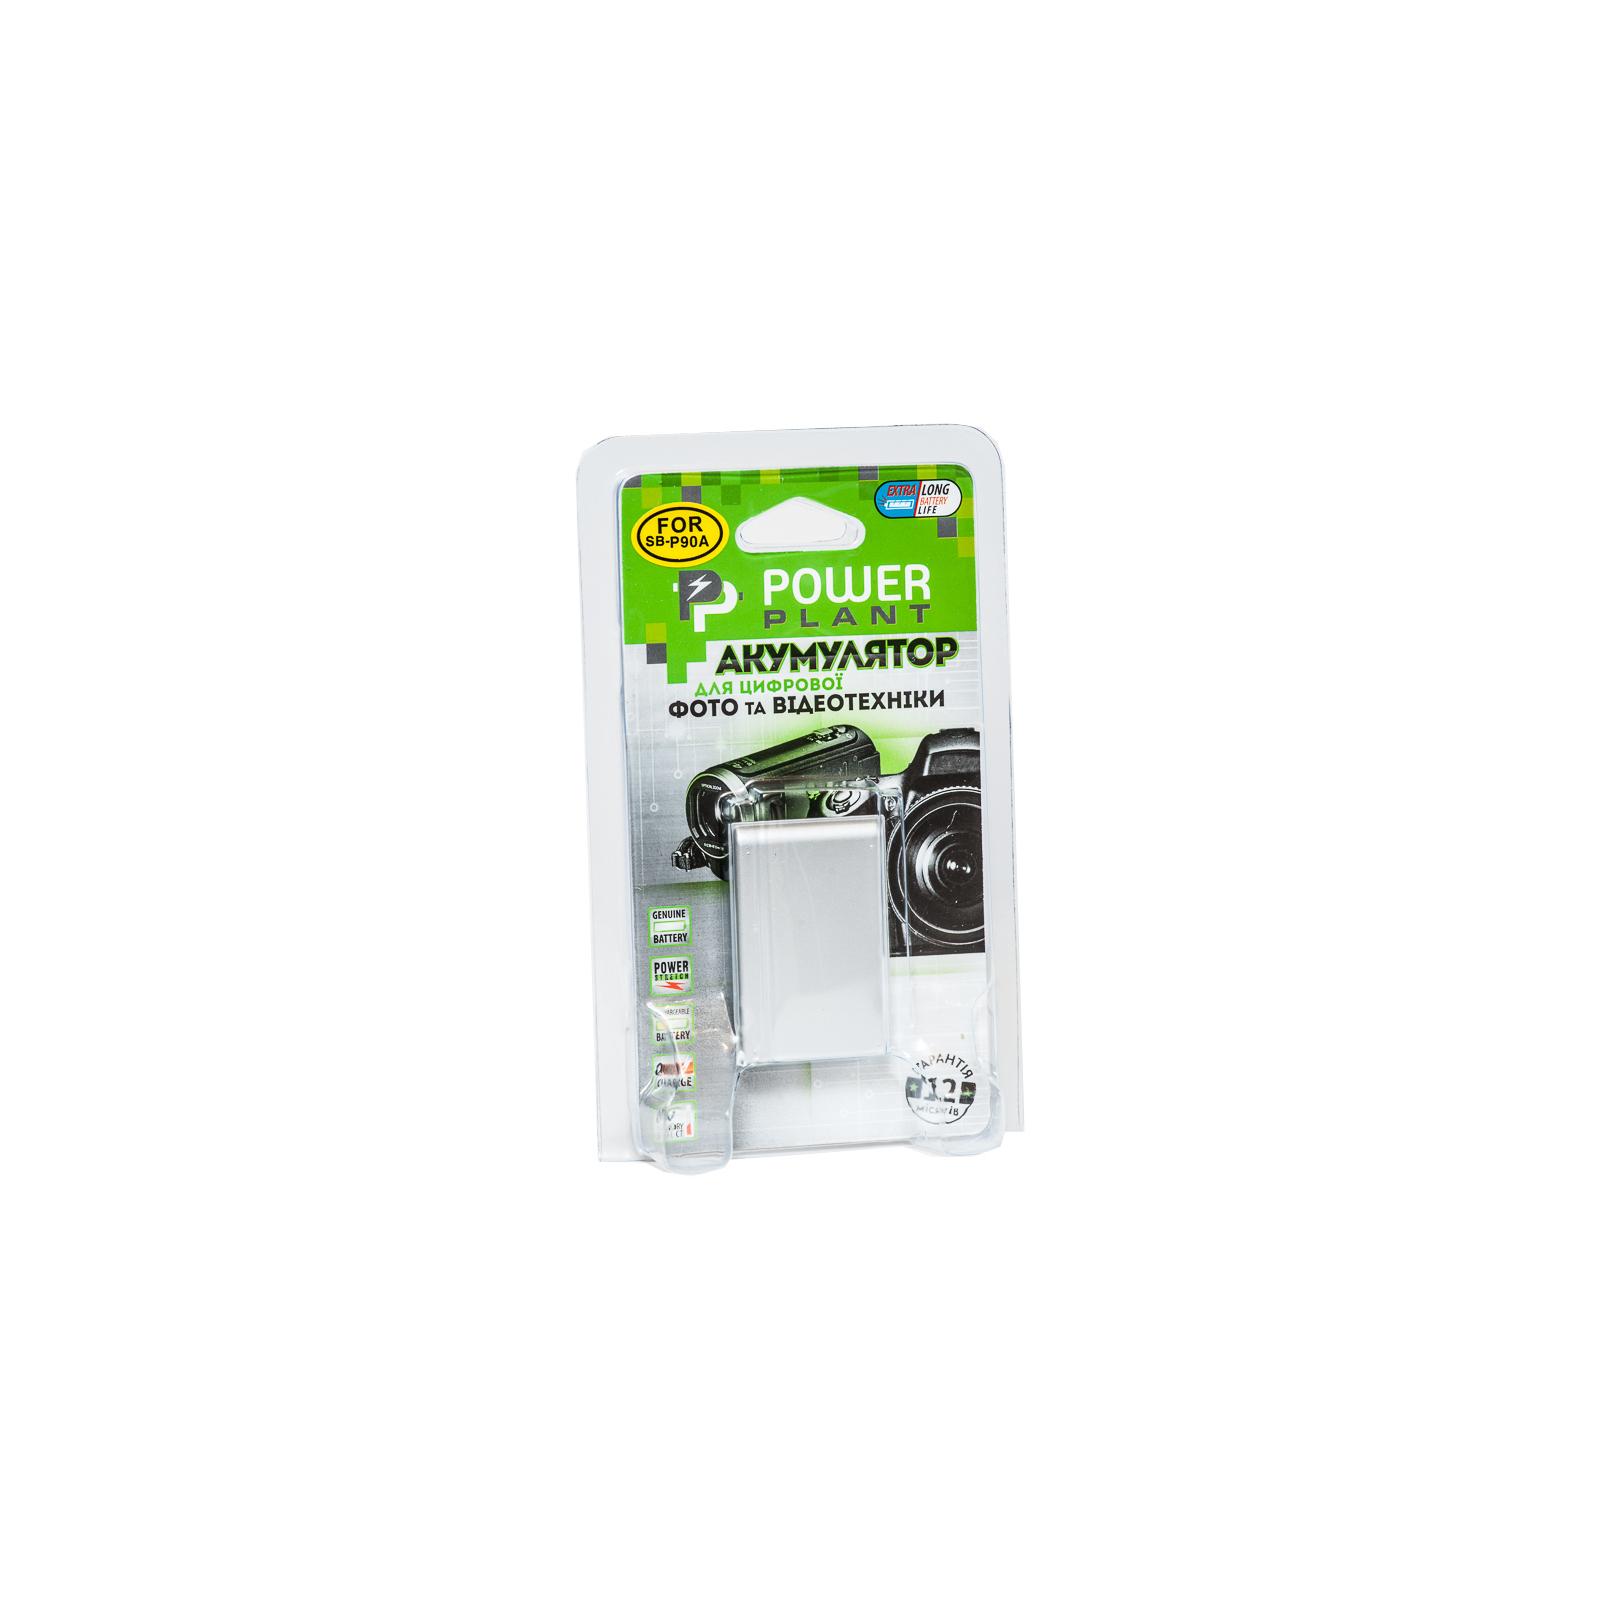 Аккумулятор к фото/видео PowerPlant Samsung SB-P90A (DV00DV1363) изображение 3